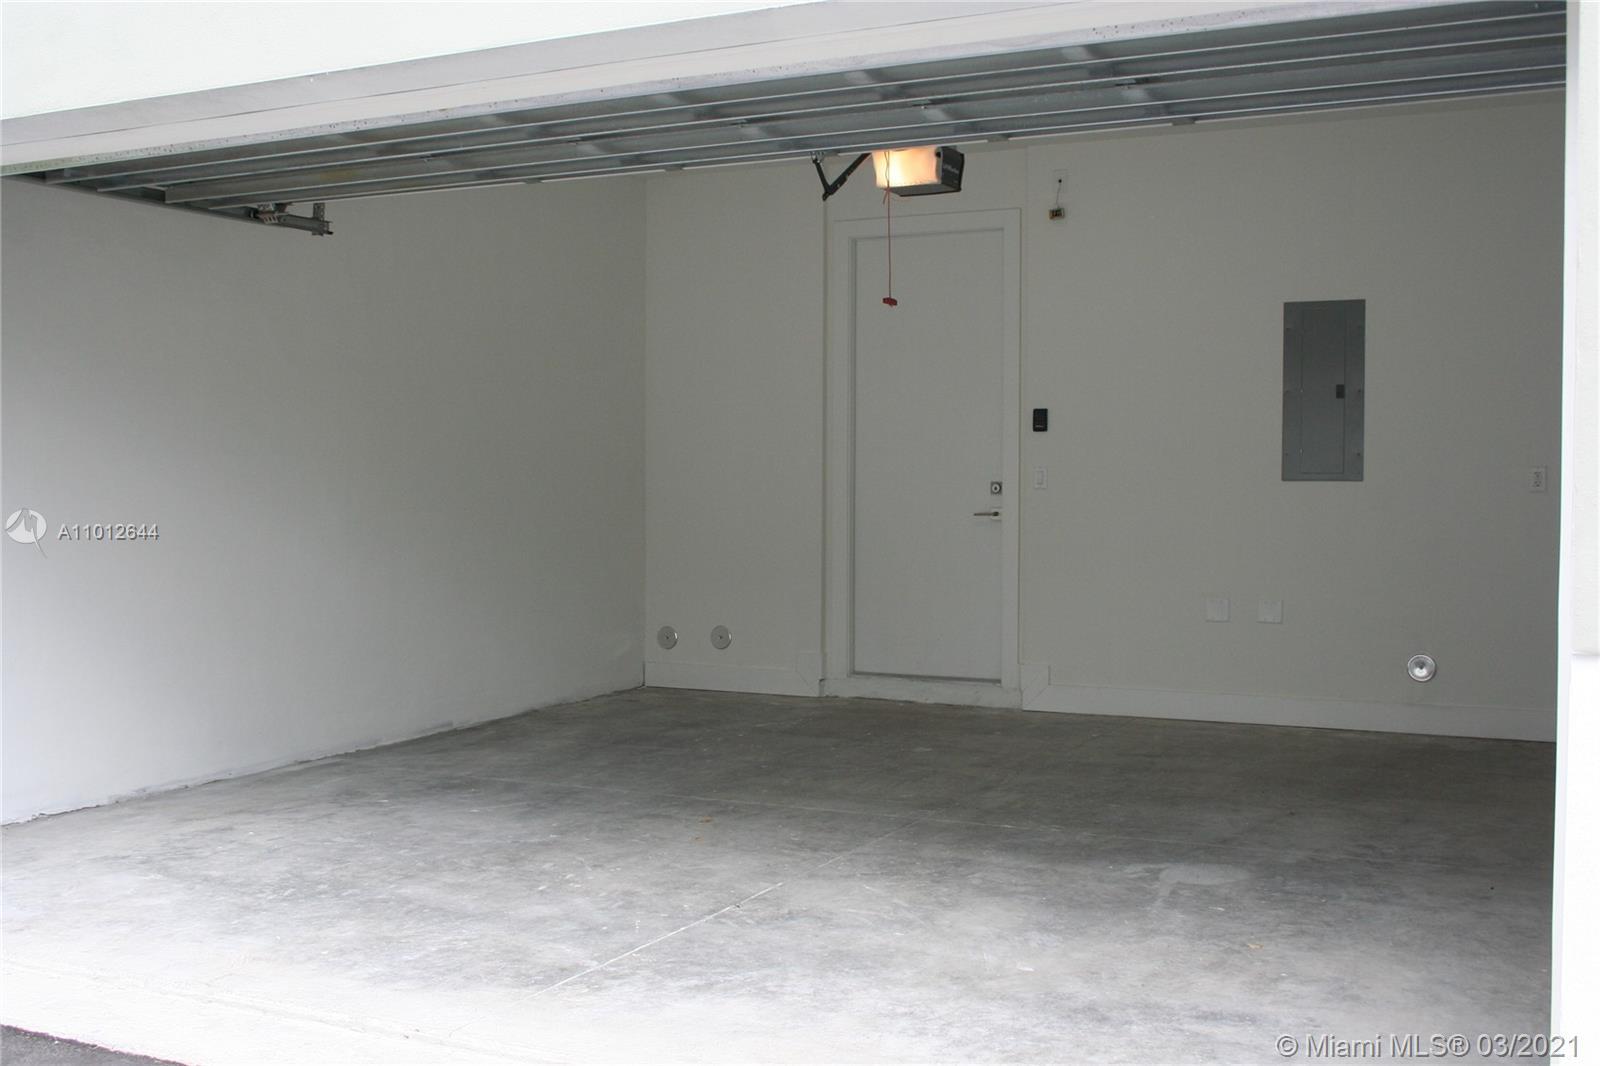 1,2,3,4,5,6,  /   sq. ft. $ 2021-03-13 0 Photo